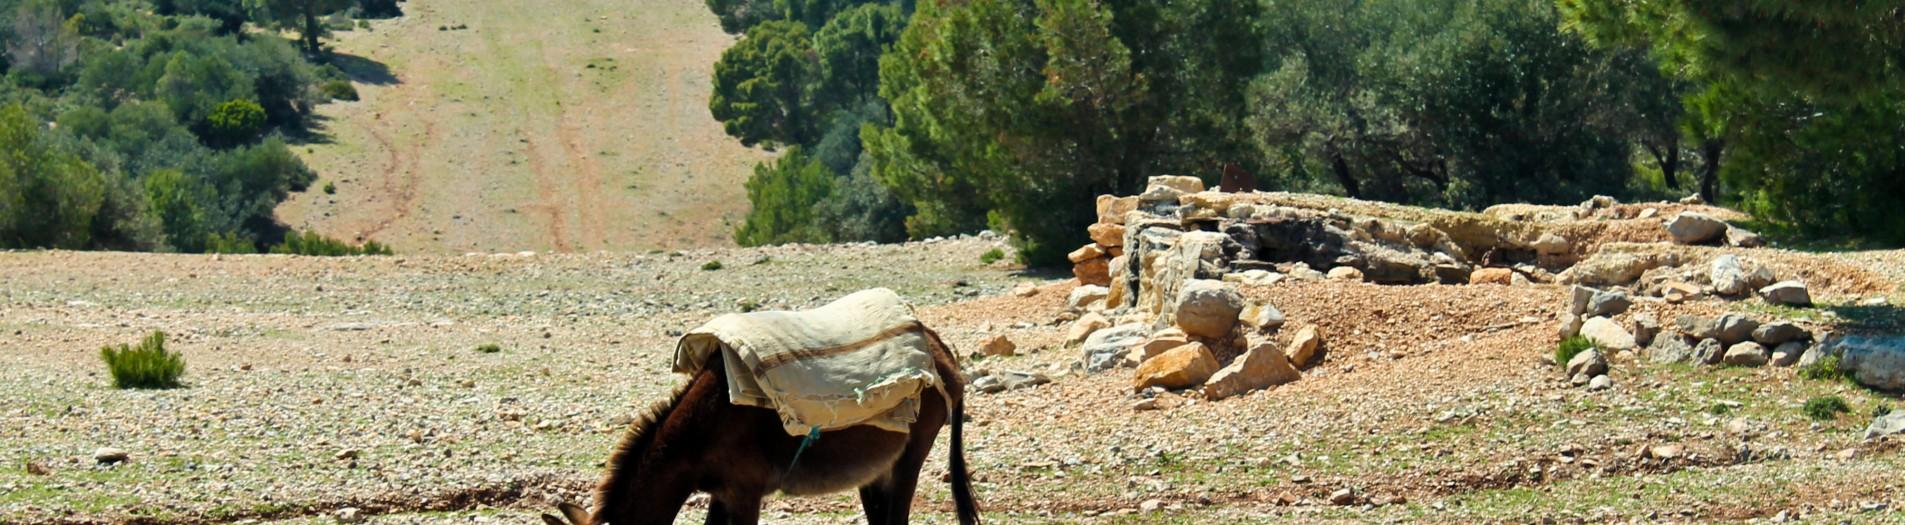 Djebel Serdj جبل السرج